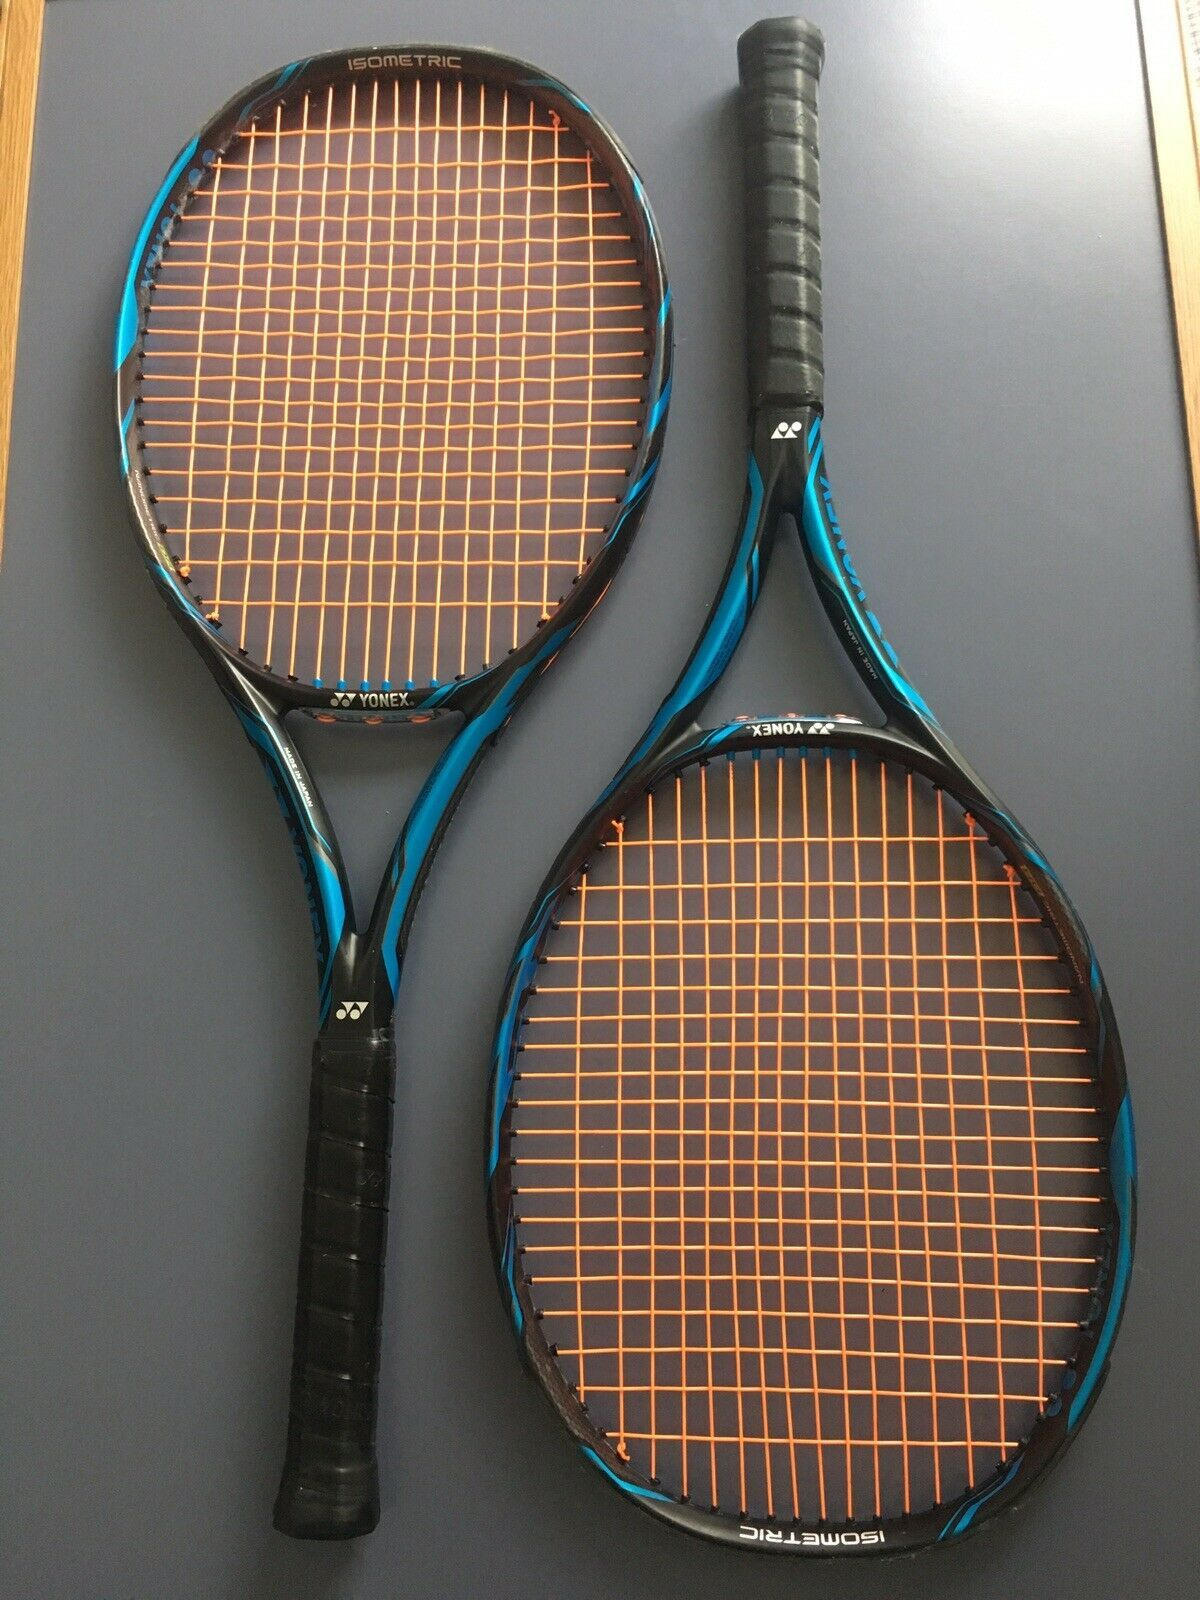 Yonex Ezone Dr 100 Tennis Racquet Tennis Racket Decor Tennis Racket Craft Tennis Racket Design Tennis Racket Cake Tennis Racket Tennis Best Tennis Rackets